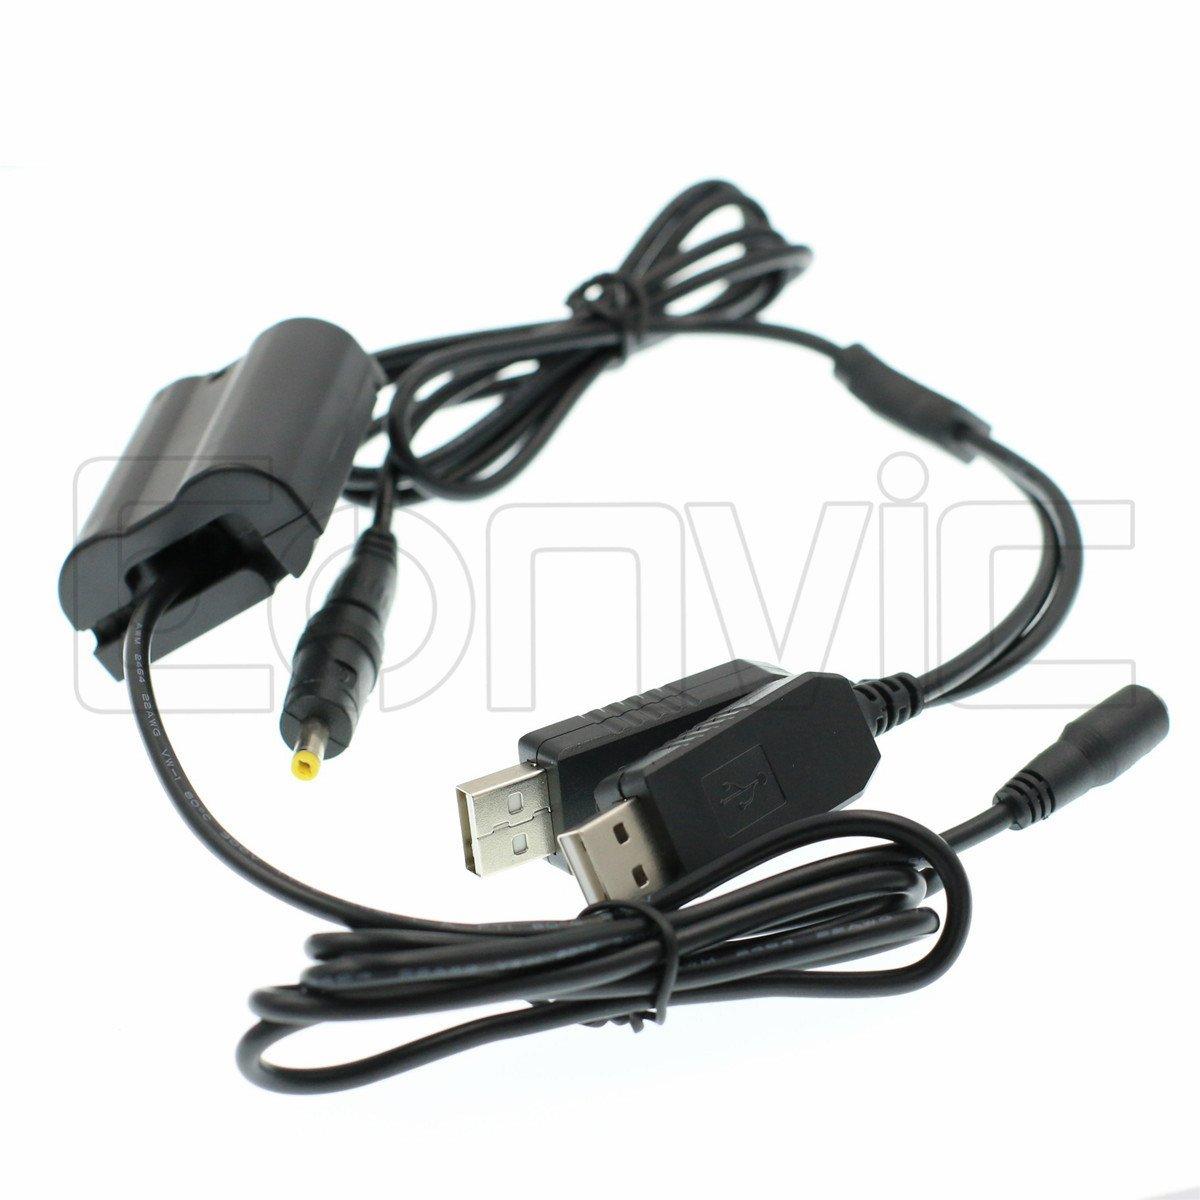 Eonvic EP-5B DC Coupler Dual USB Adapter Cable for Nikon V1 D800 D7200 D610 D810